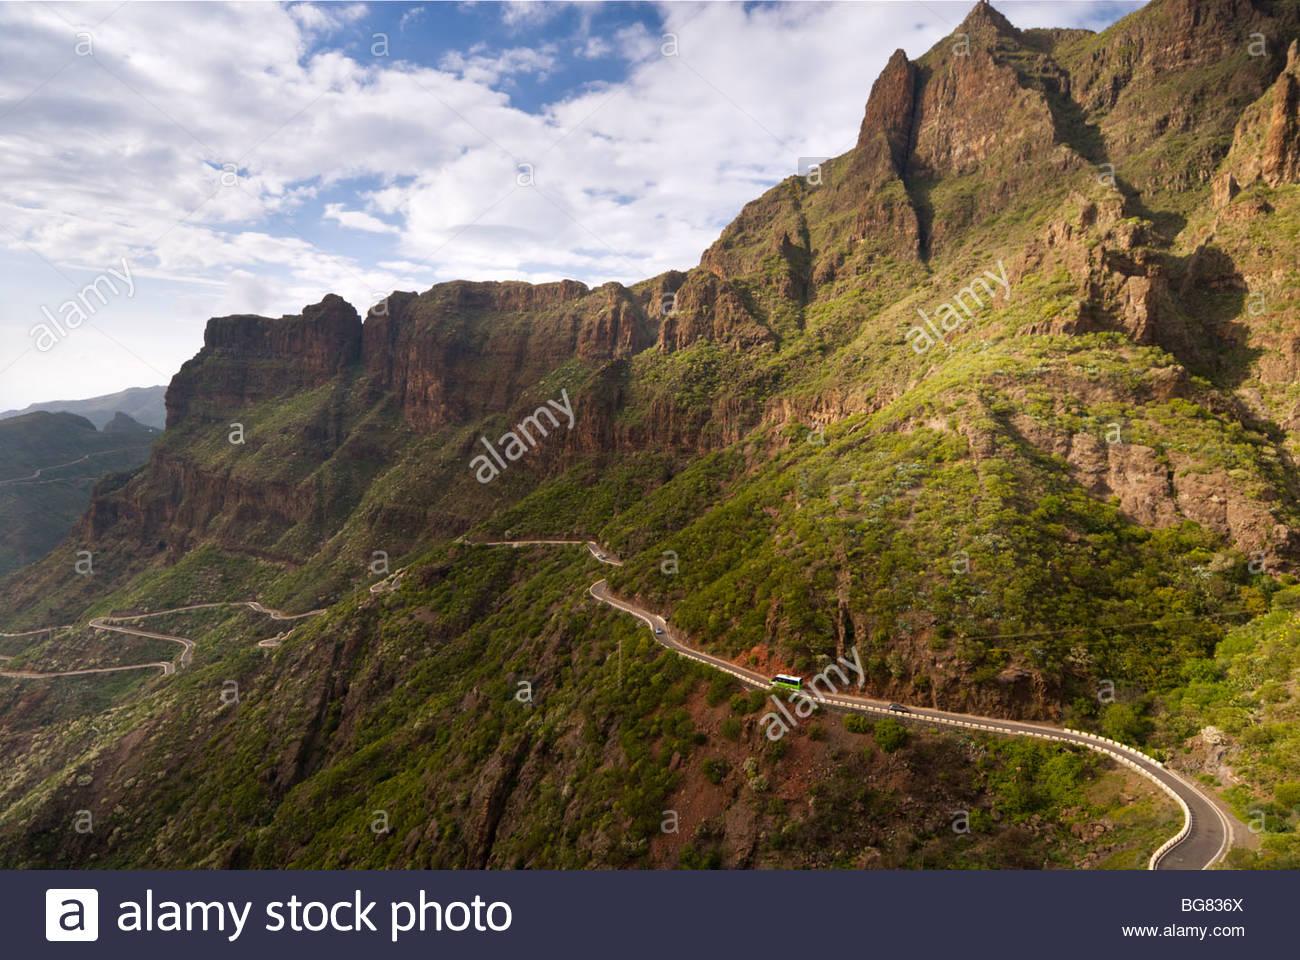 La route de Masca, Tenerife, Canaries, Espagne. Photo Stock